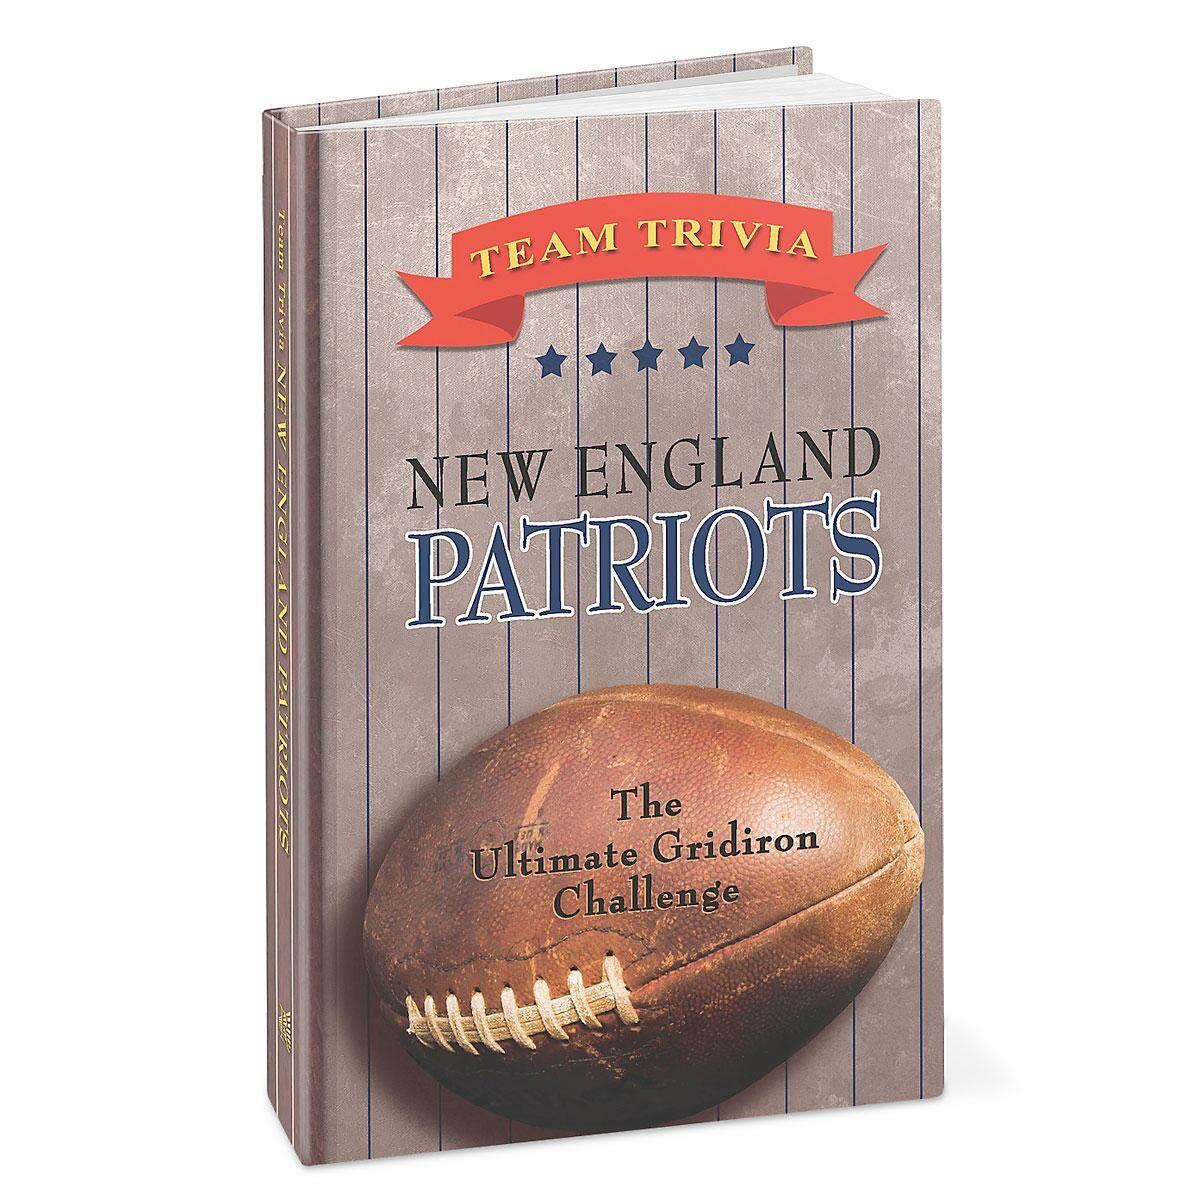 New England Patriots NFL Team Trivia Book